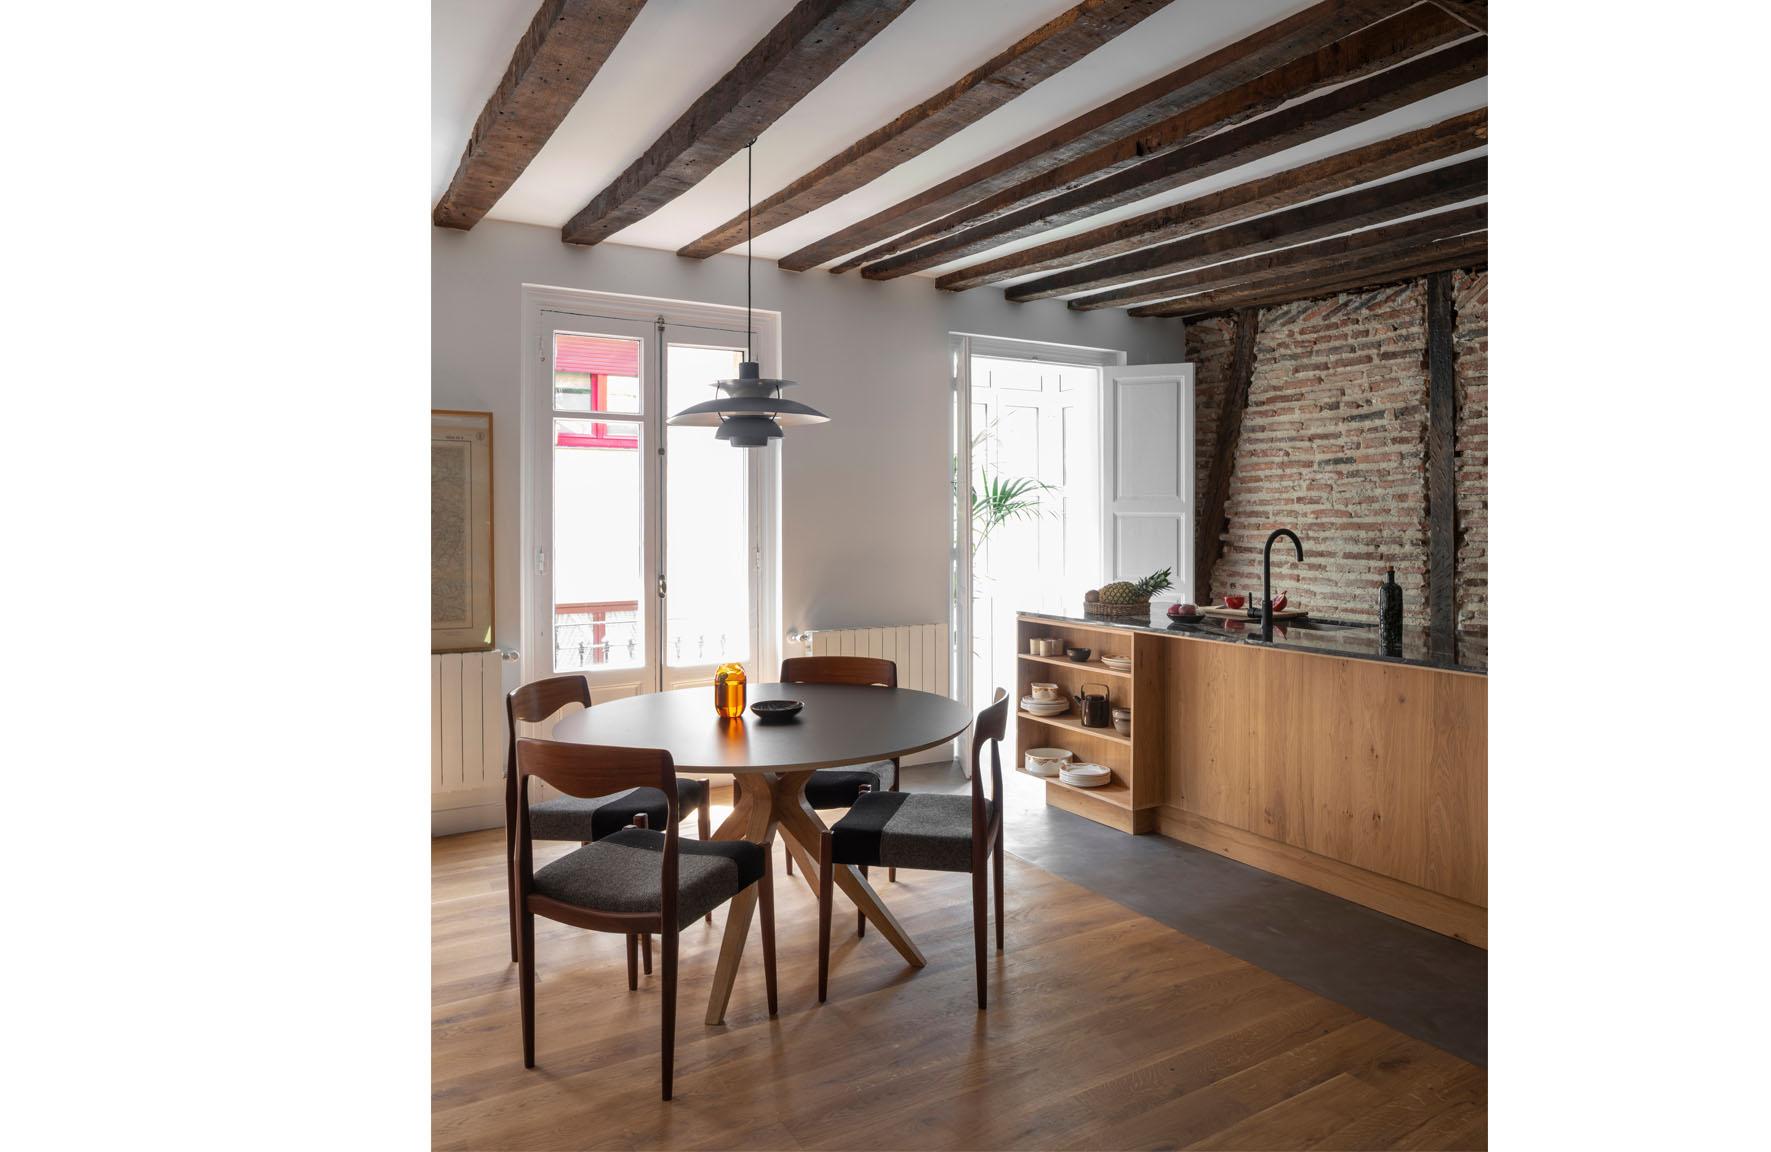 Apartment Esperanza-Bilbao-Image 02.jpg